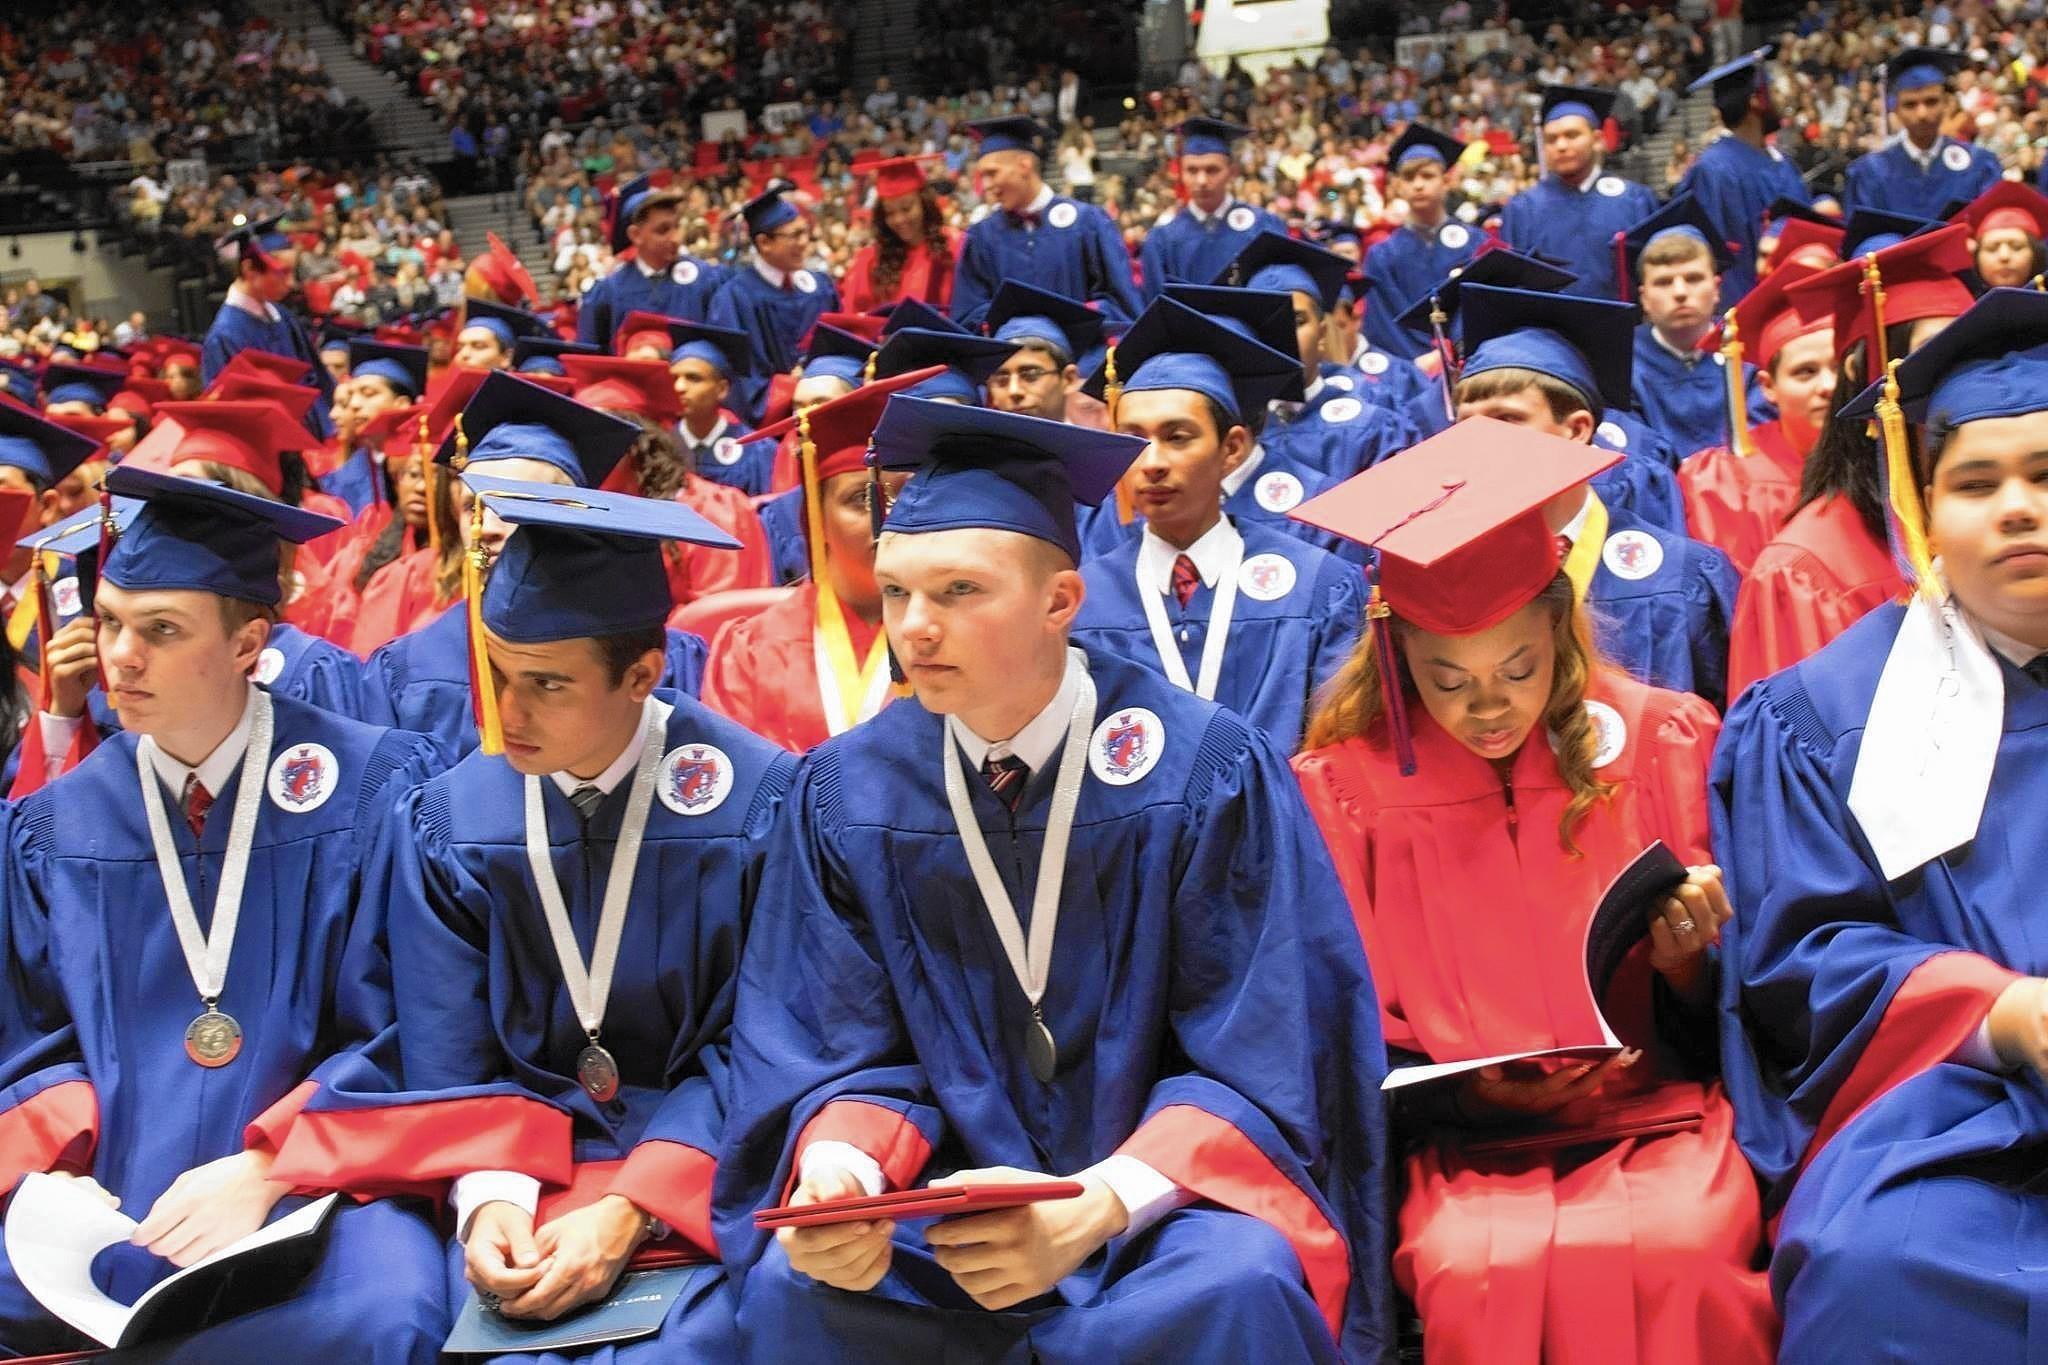 Graduation 2017 German International School Chicago: More Than 800 Graduate From West Aurora High School